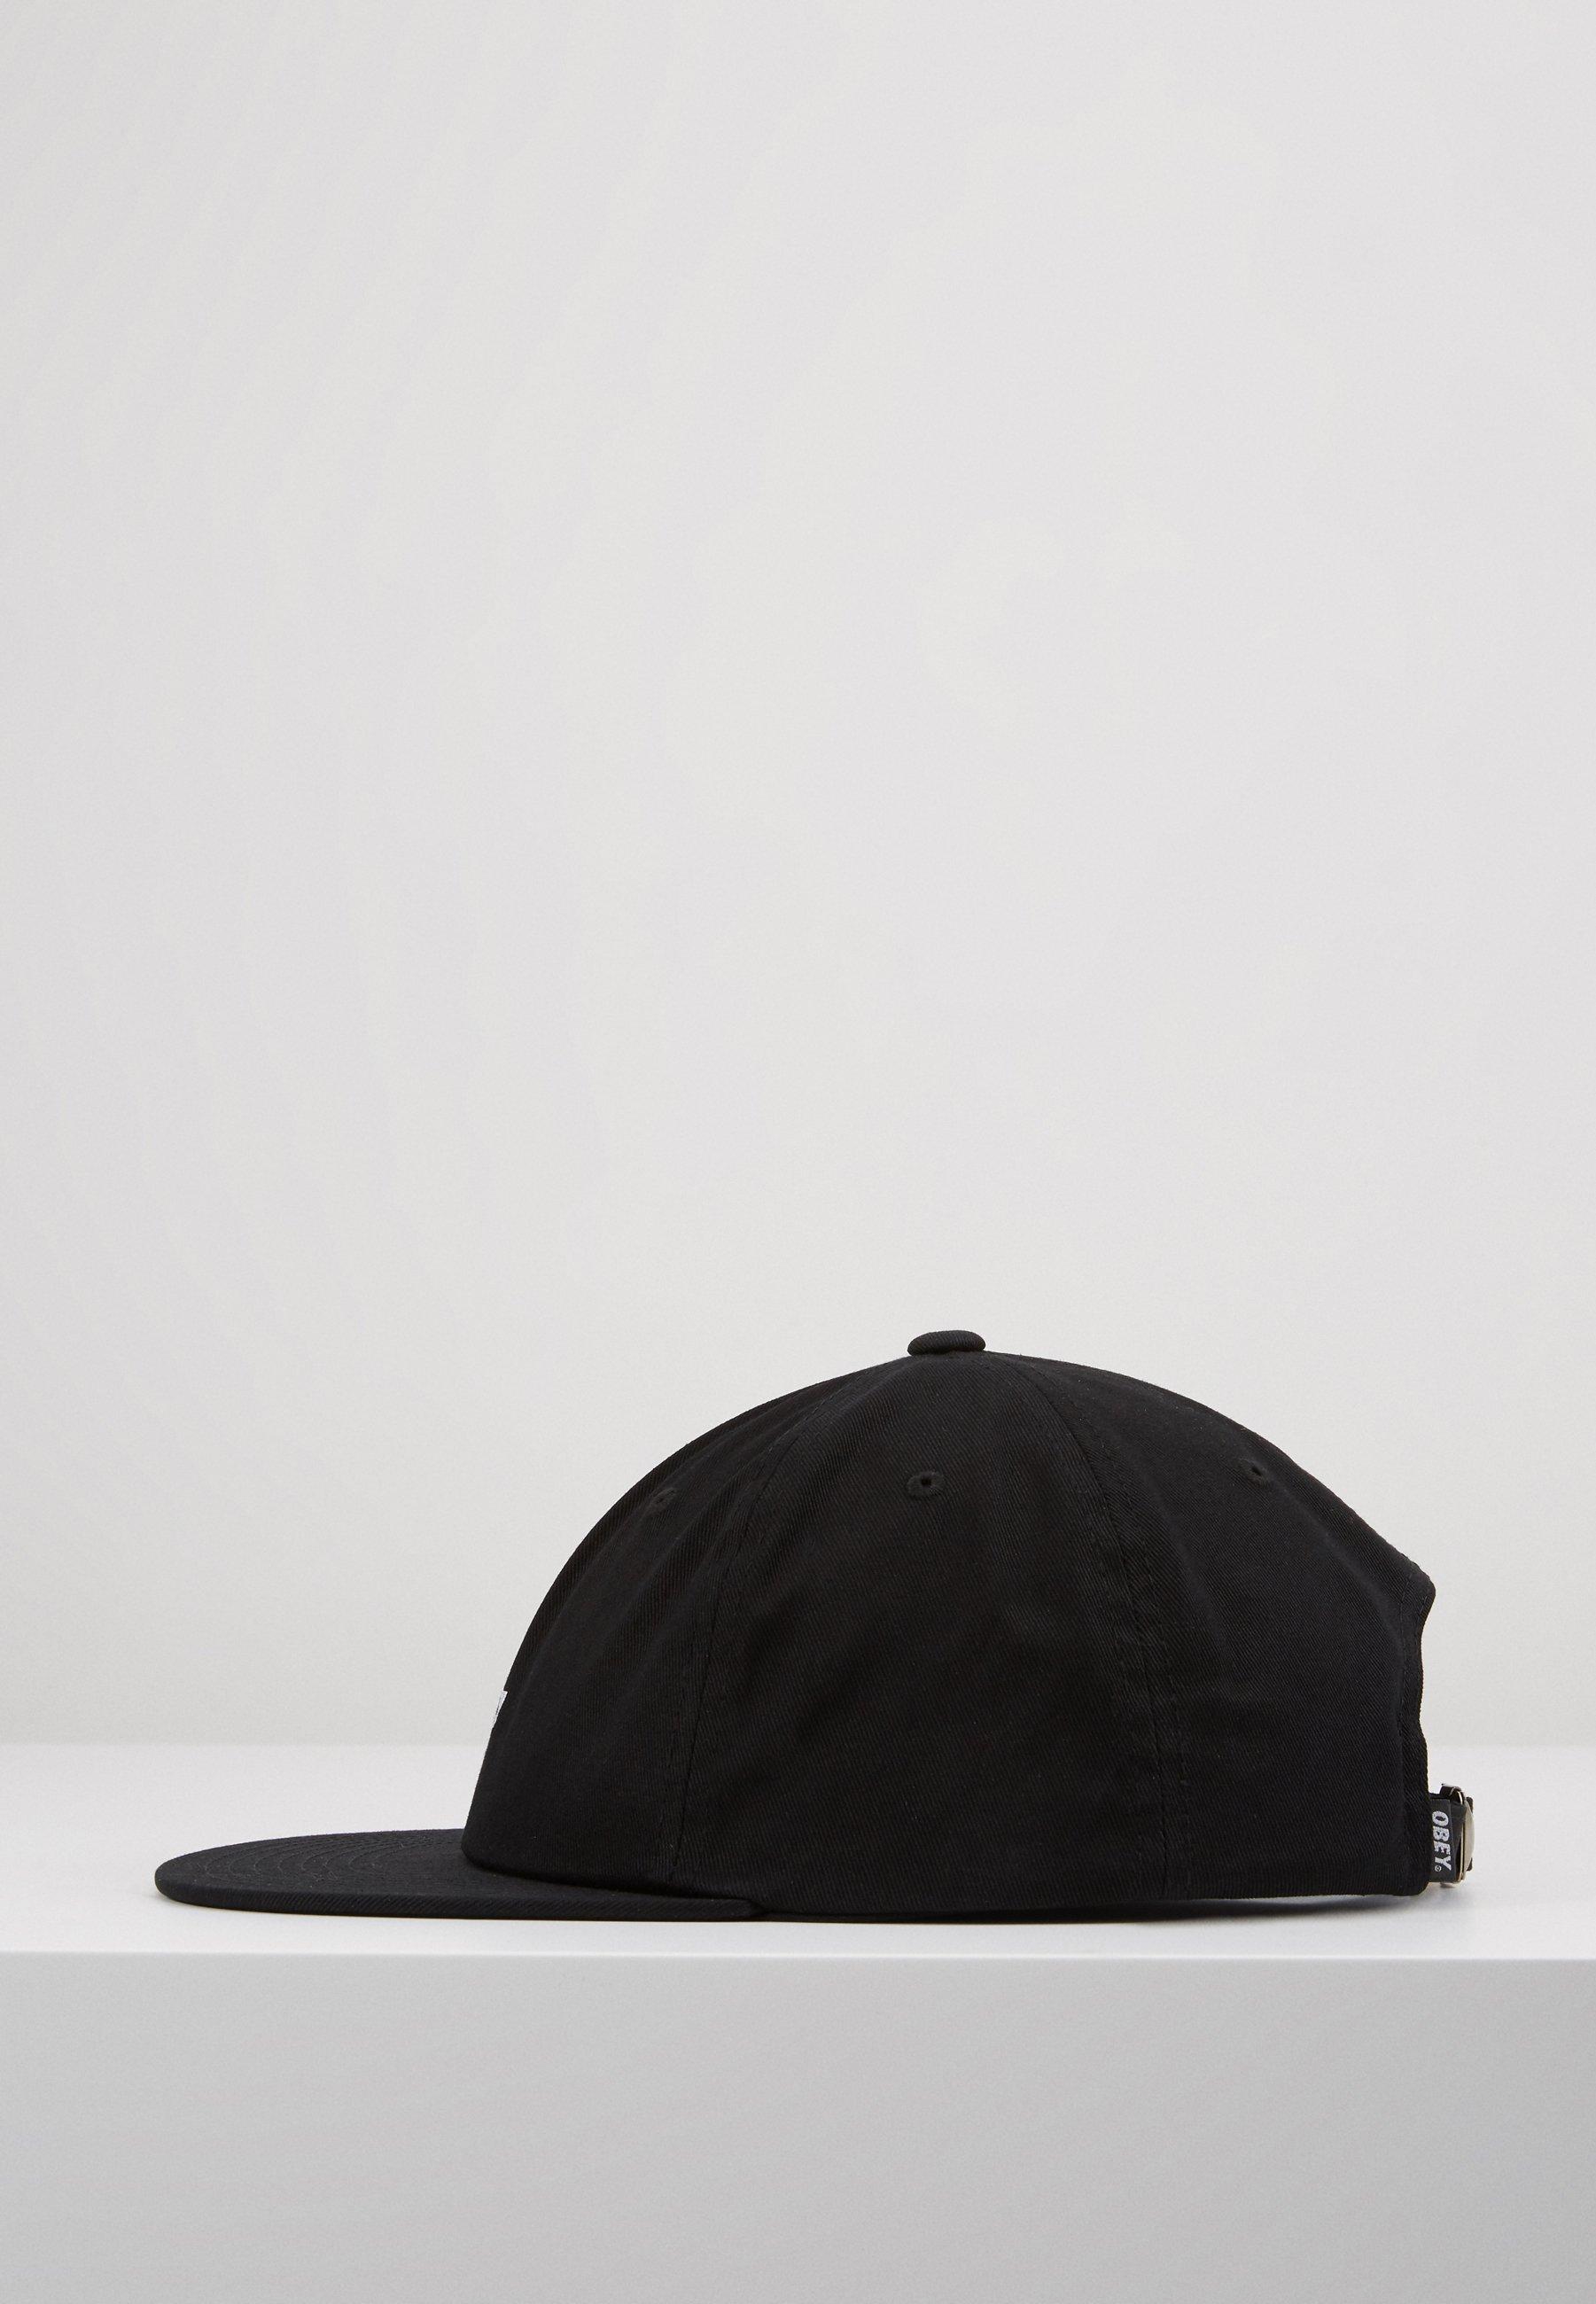 Obey Clothing Jumbled 6 Panel Strapback - Cap Black/schwarz